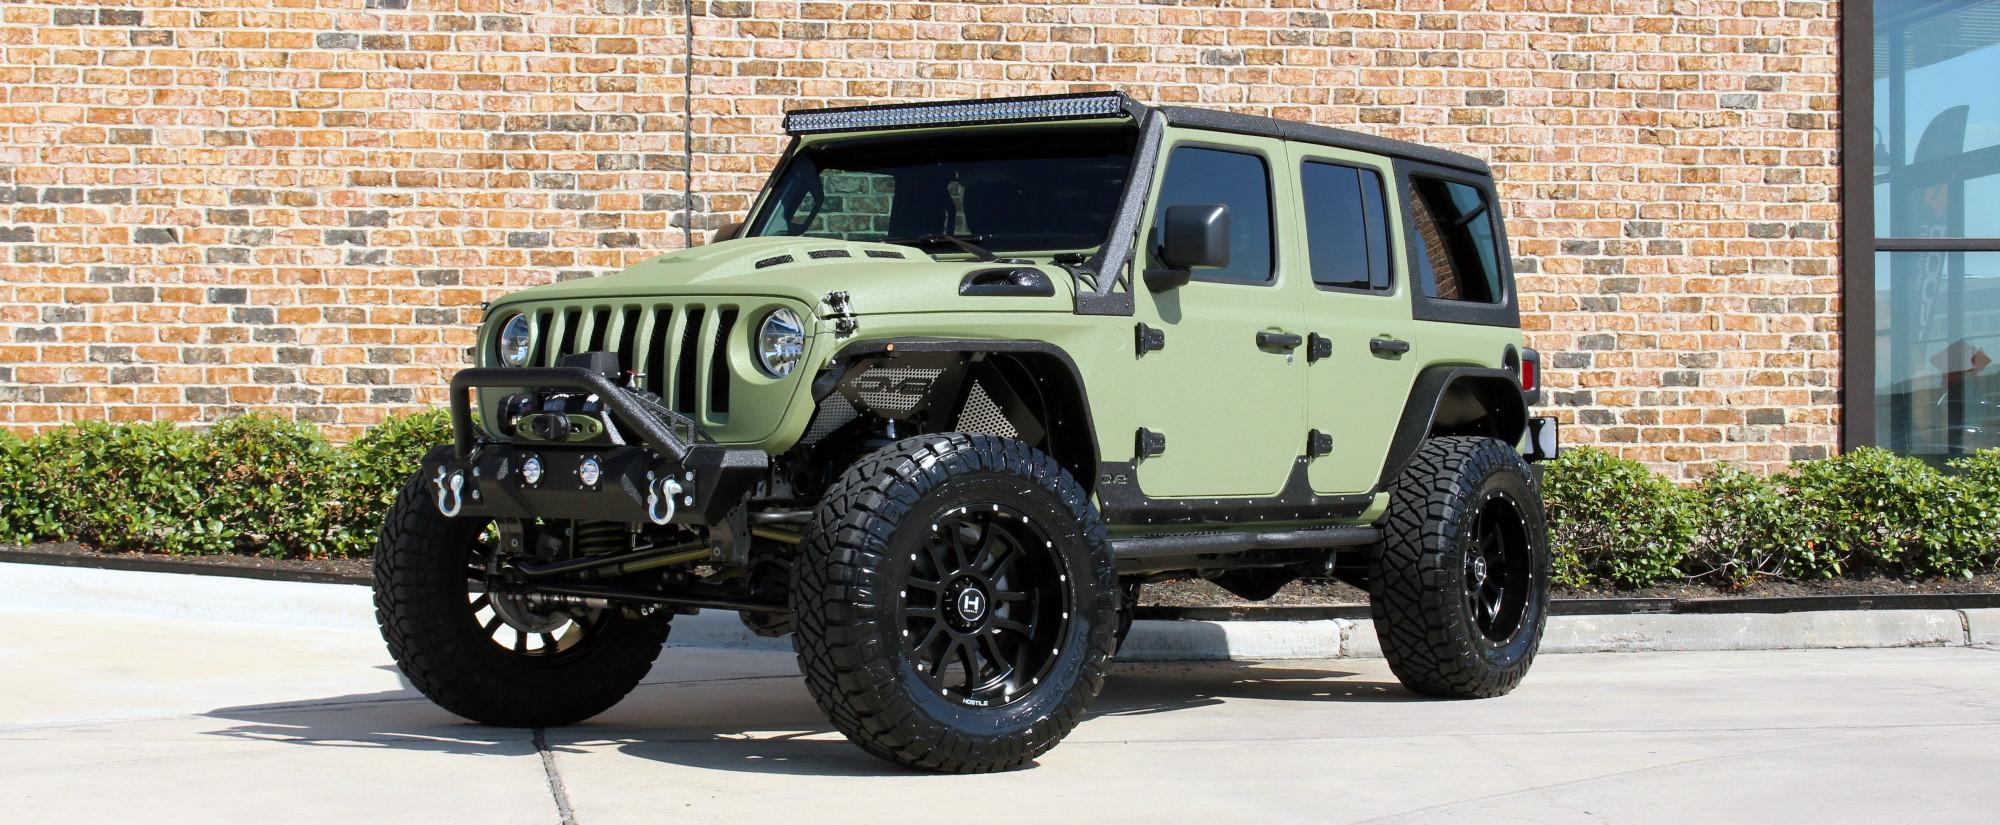 2019 jeep wrangler unlimited jl army green kevlar